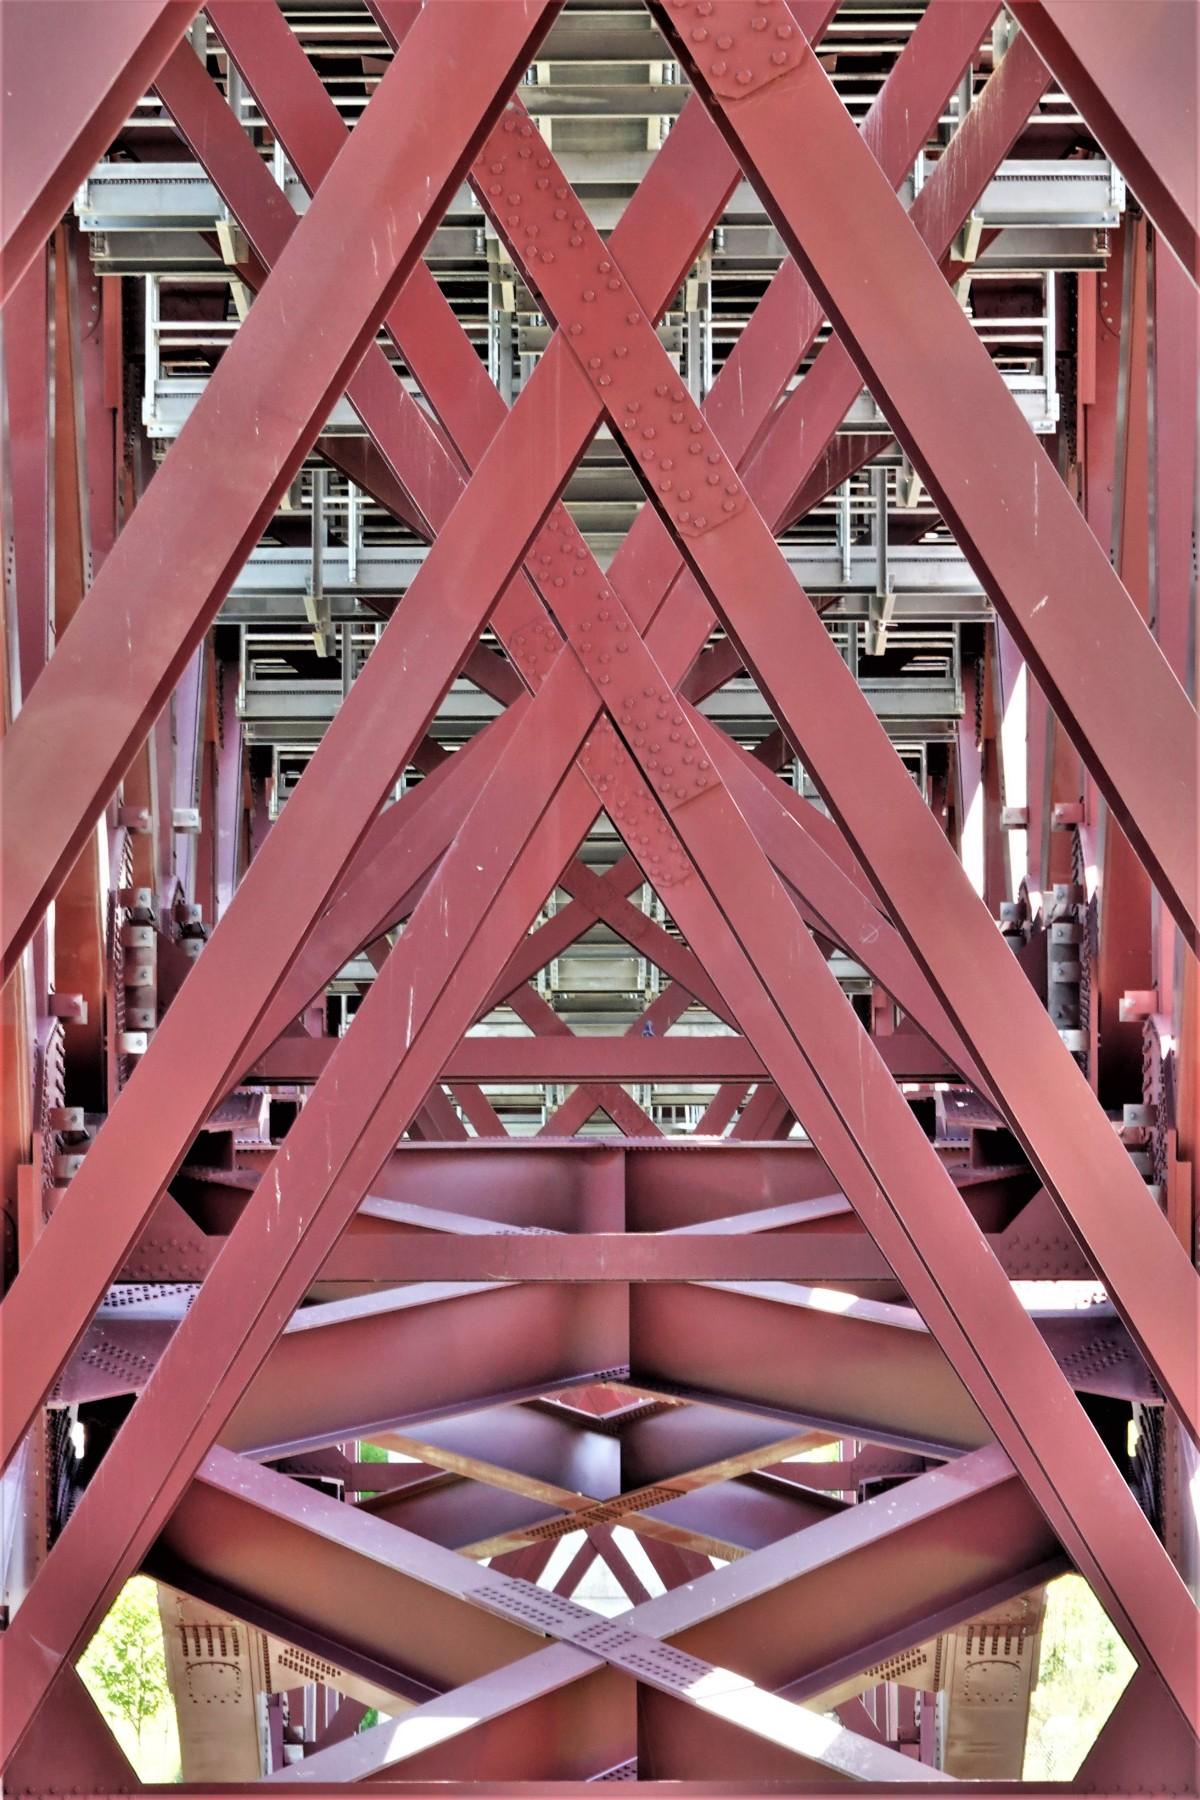 RR span girders